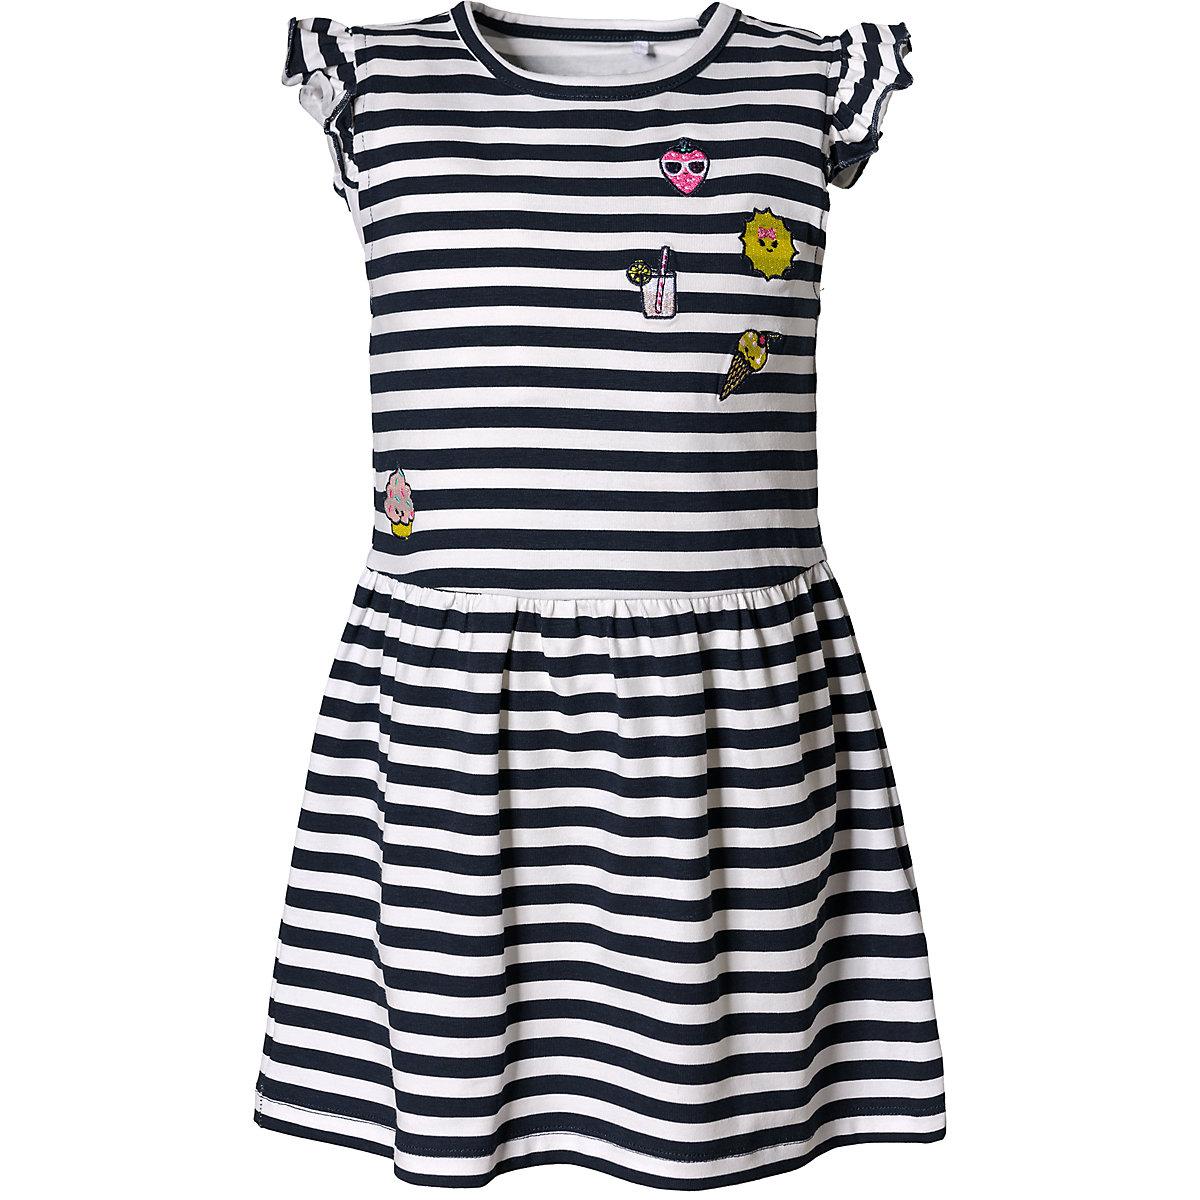 Фото - NAME IT Dresses 10623487 dress for girls baby clothing name it dresses 10626724 dress for girls baby clothing